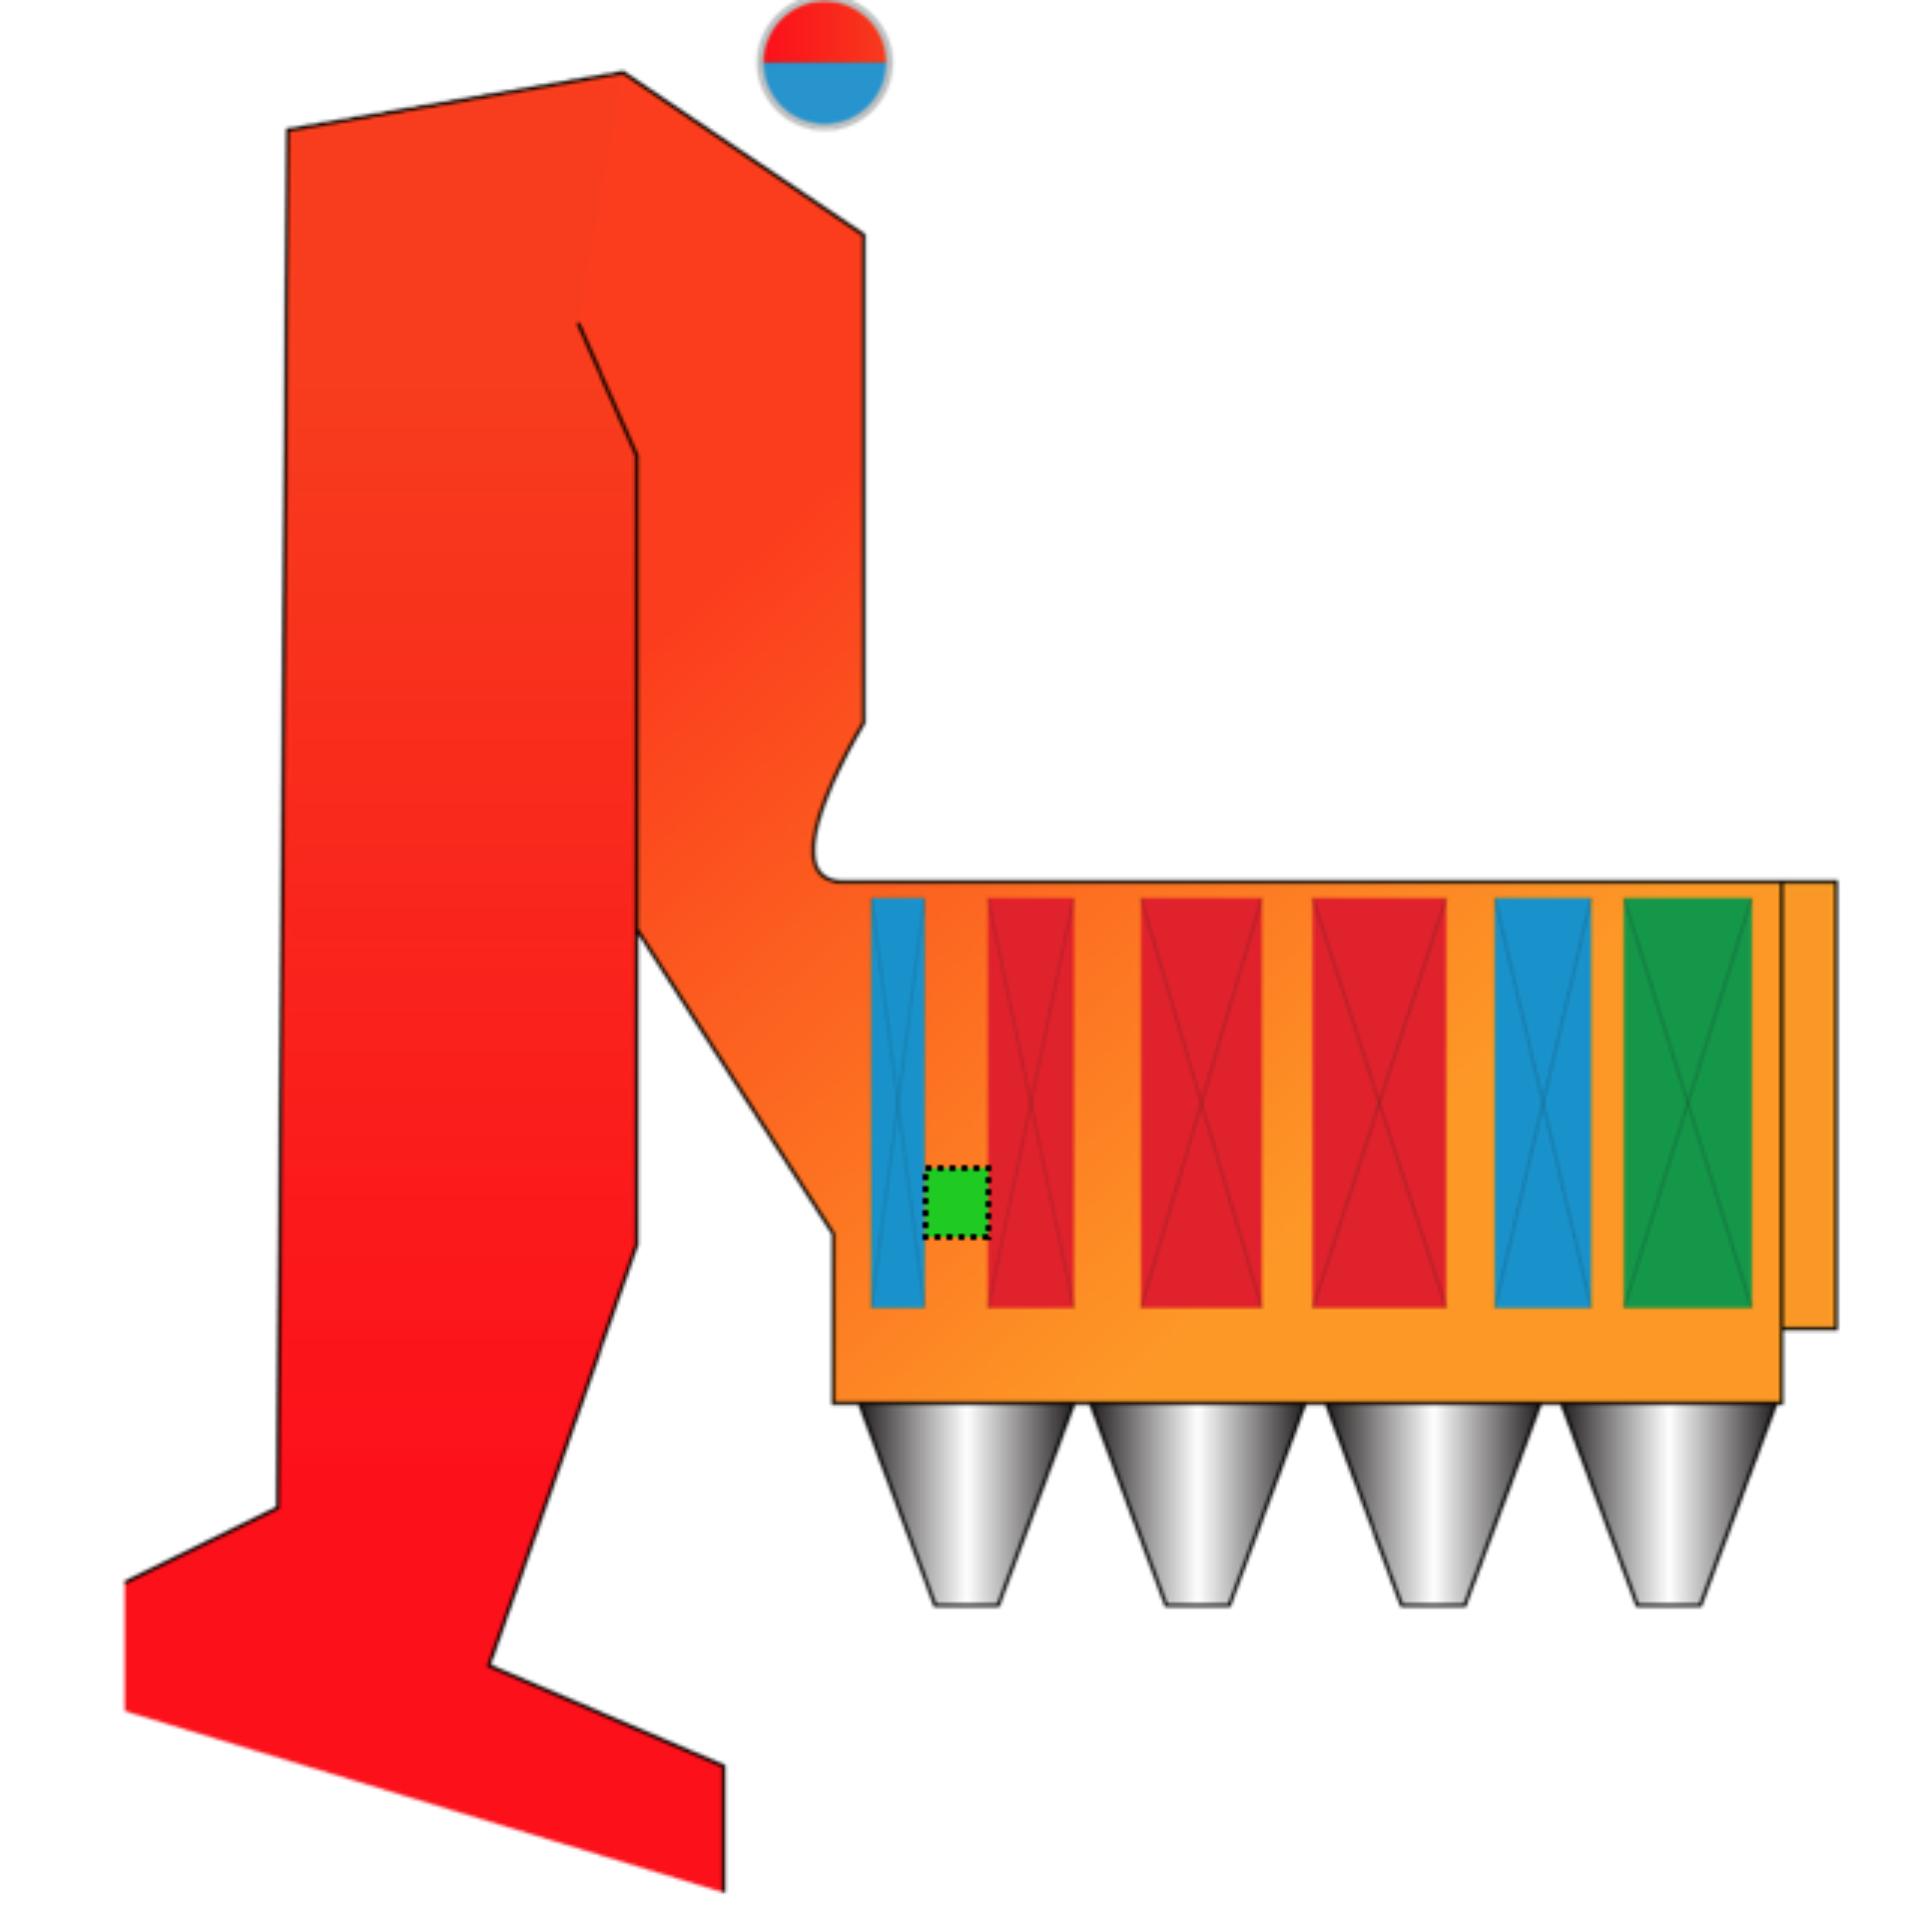 explosion-power-efw-reference-plant-breisgau-shock-pulse-generator-eg10